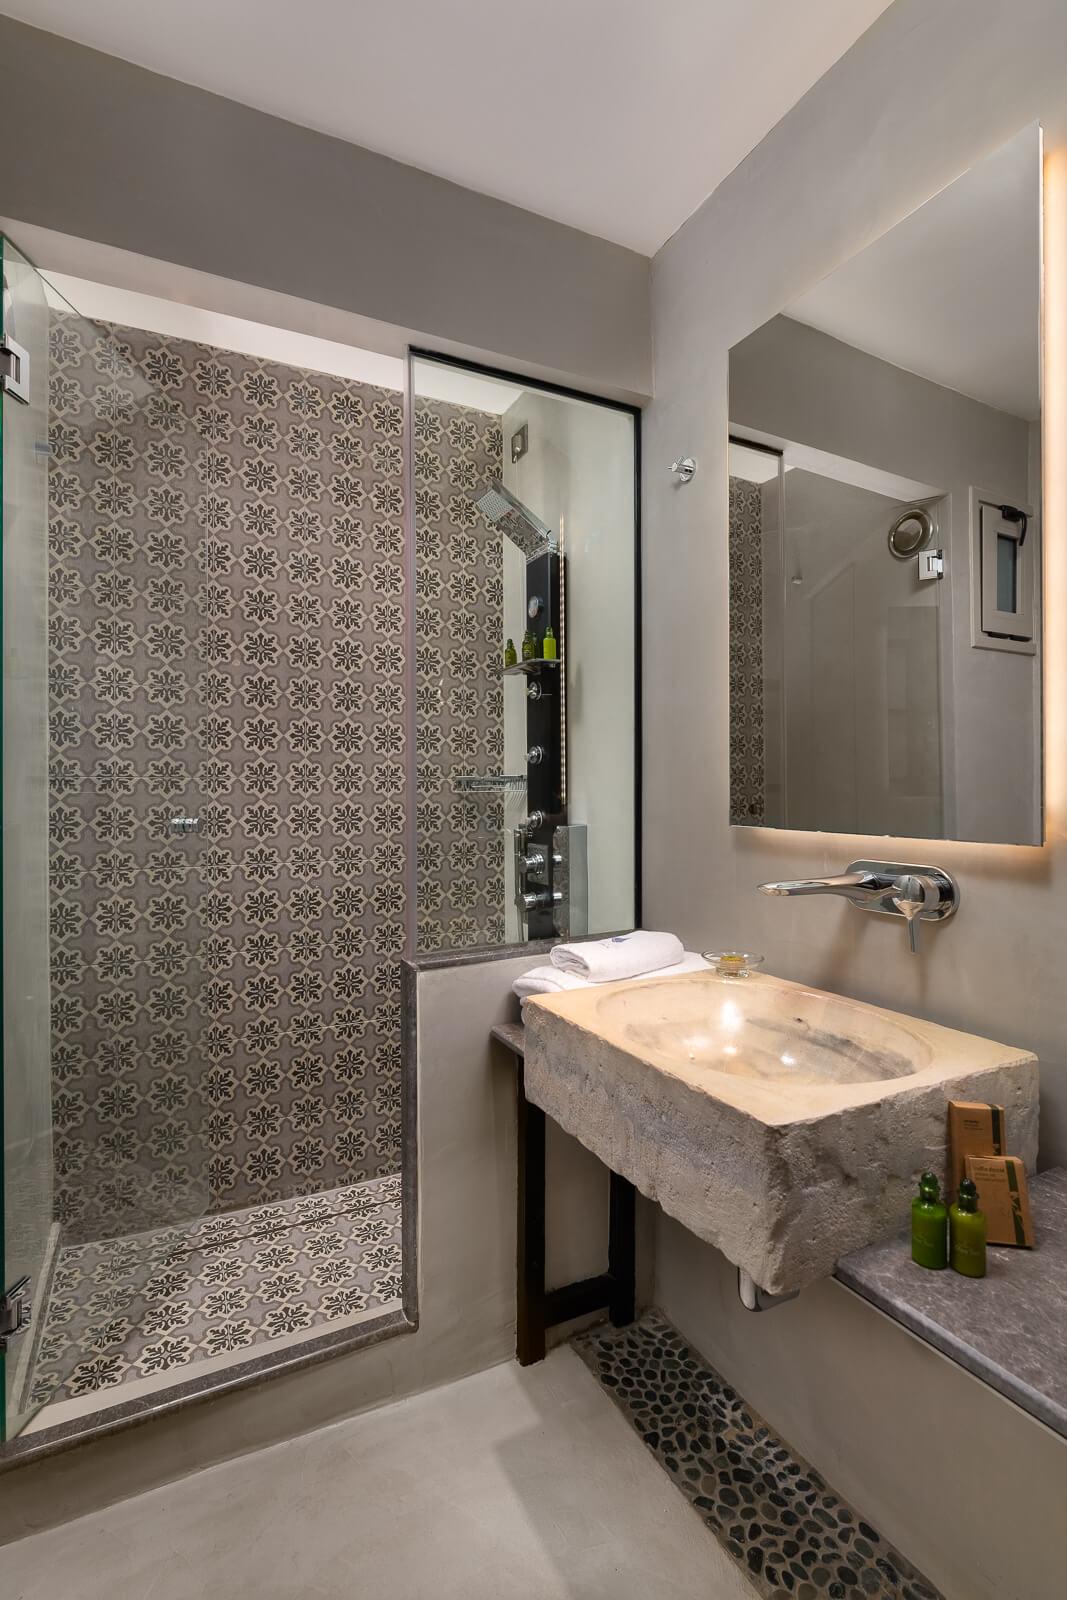 Vrachos Hotel Bathroom - Elakati Best Hotel in Rhodes Greece